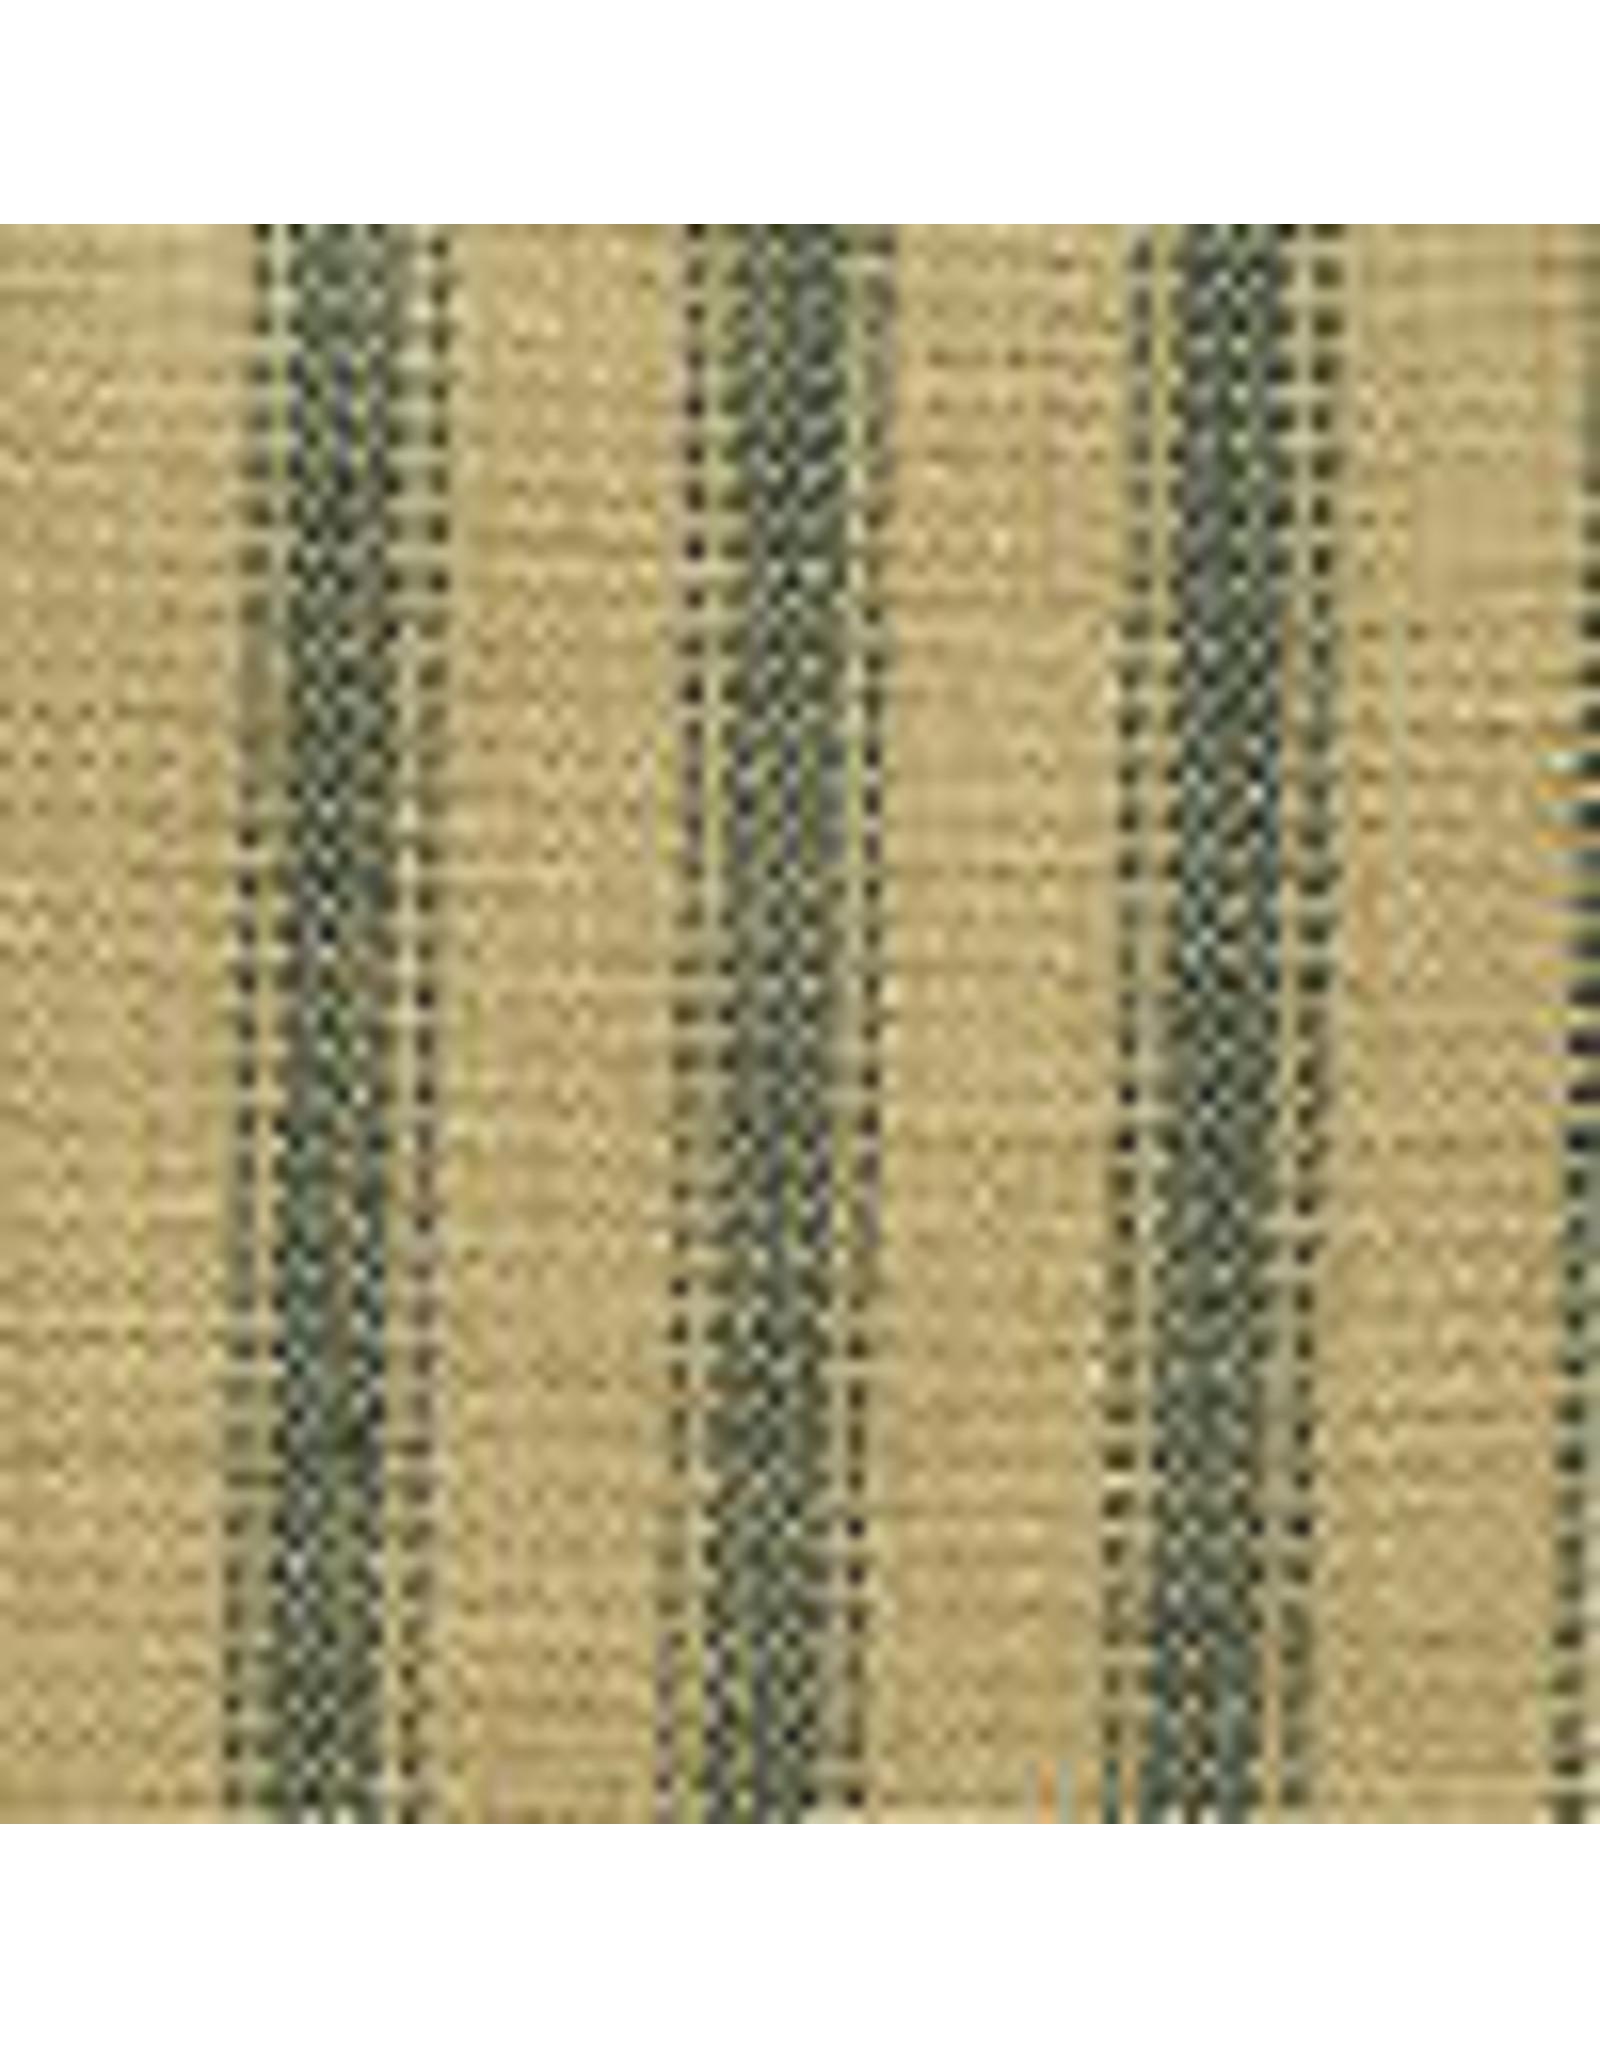 Yd. Green and Tan Ticking Fabric #46